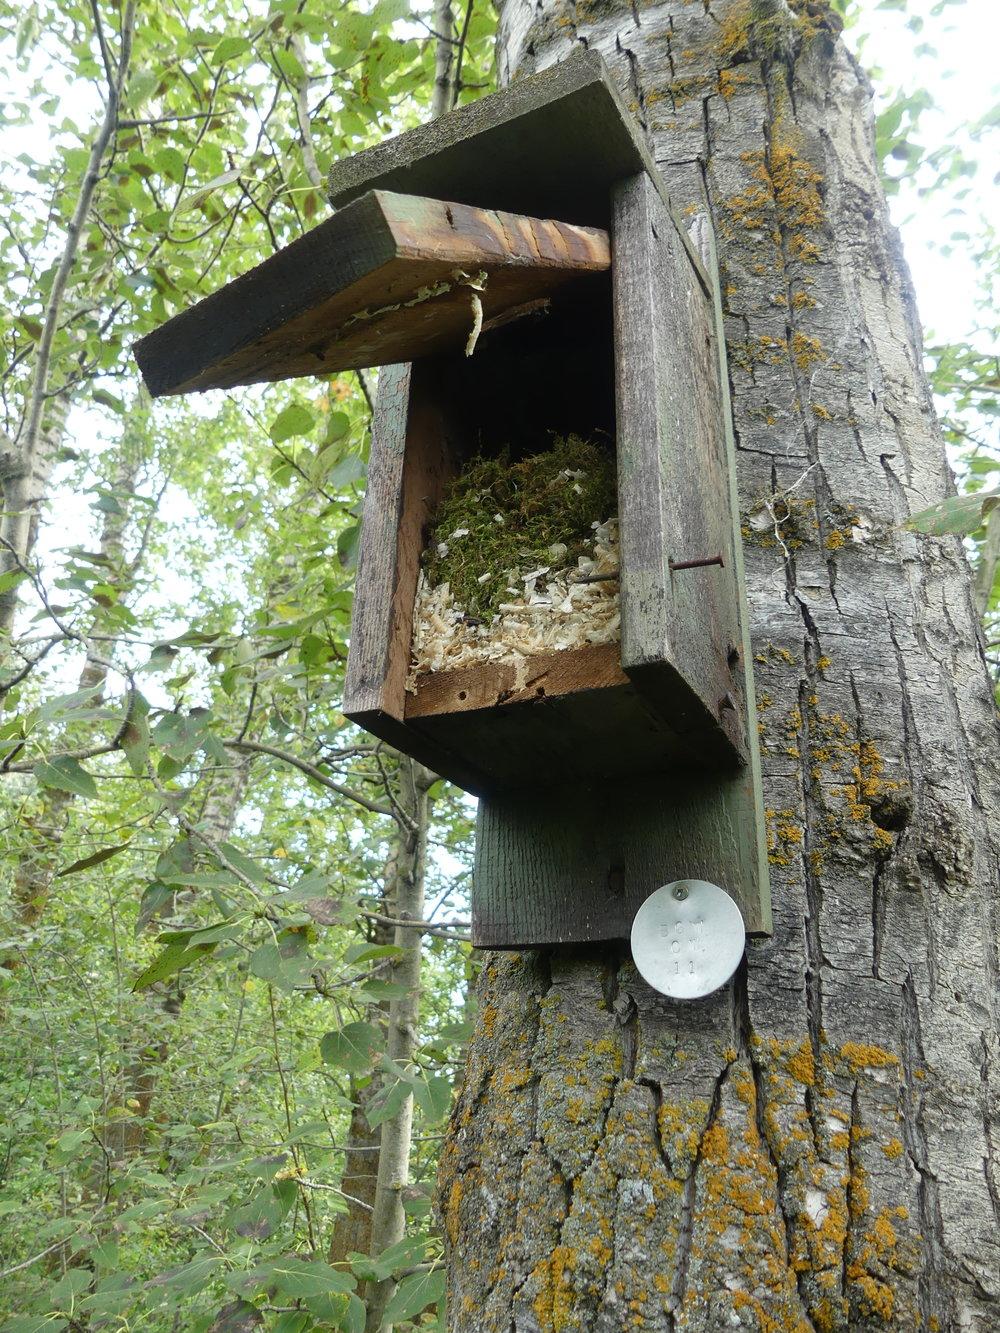 A Black-capped Chickadee nest at Boisvert's Greenwoods